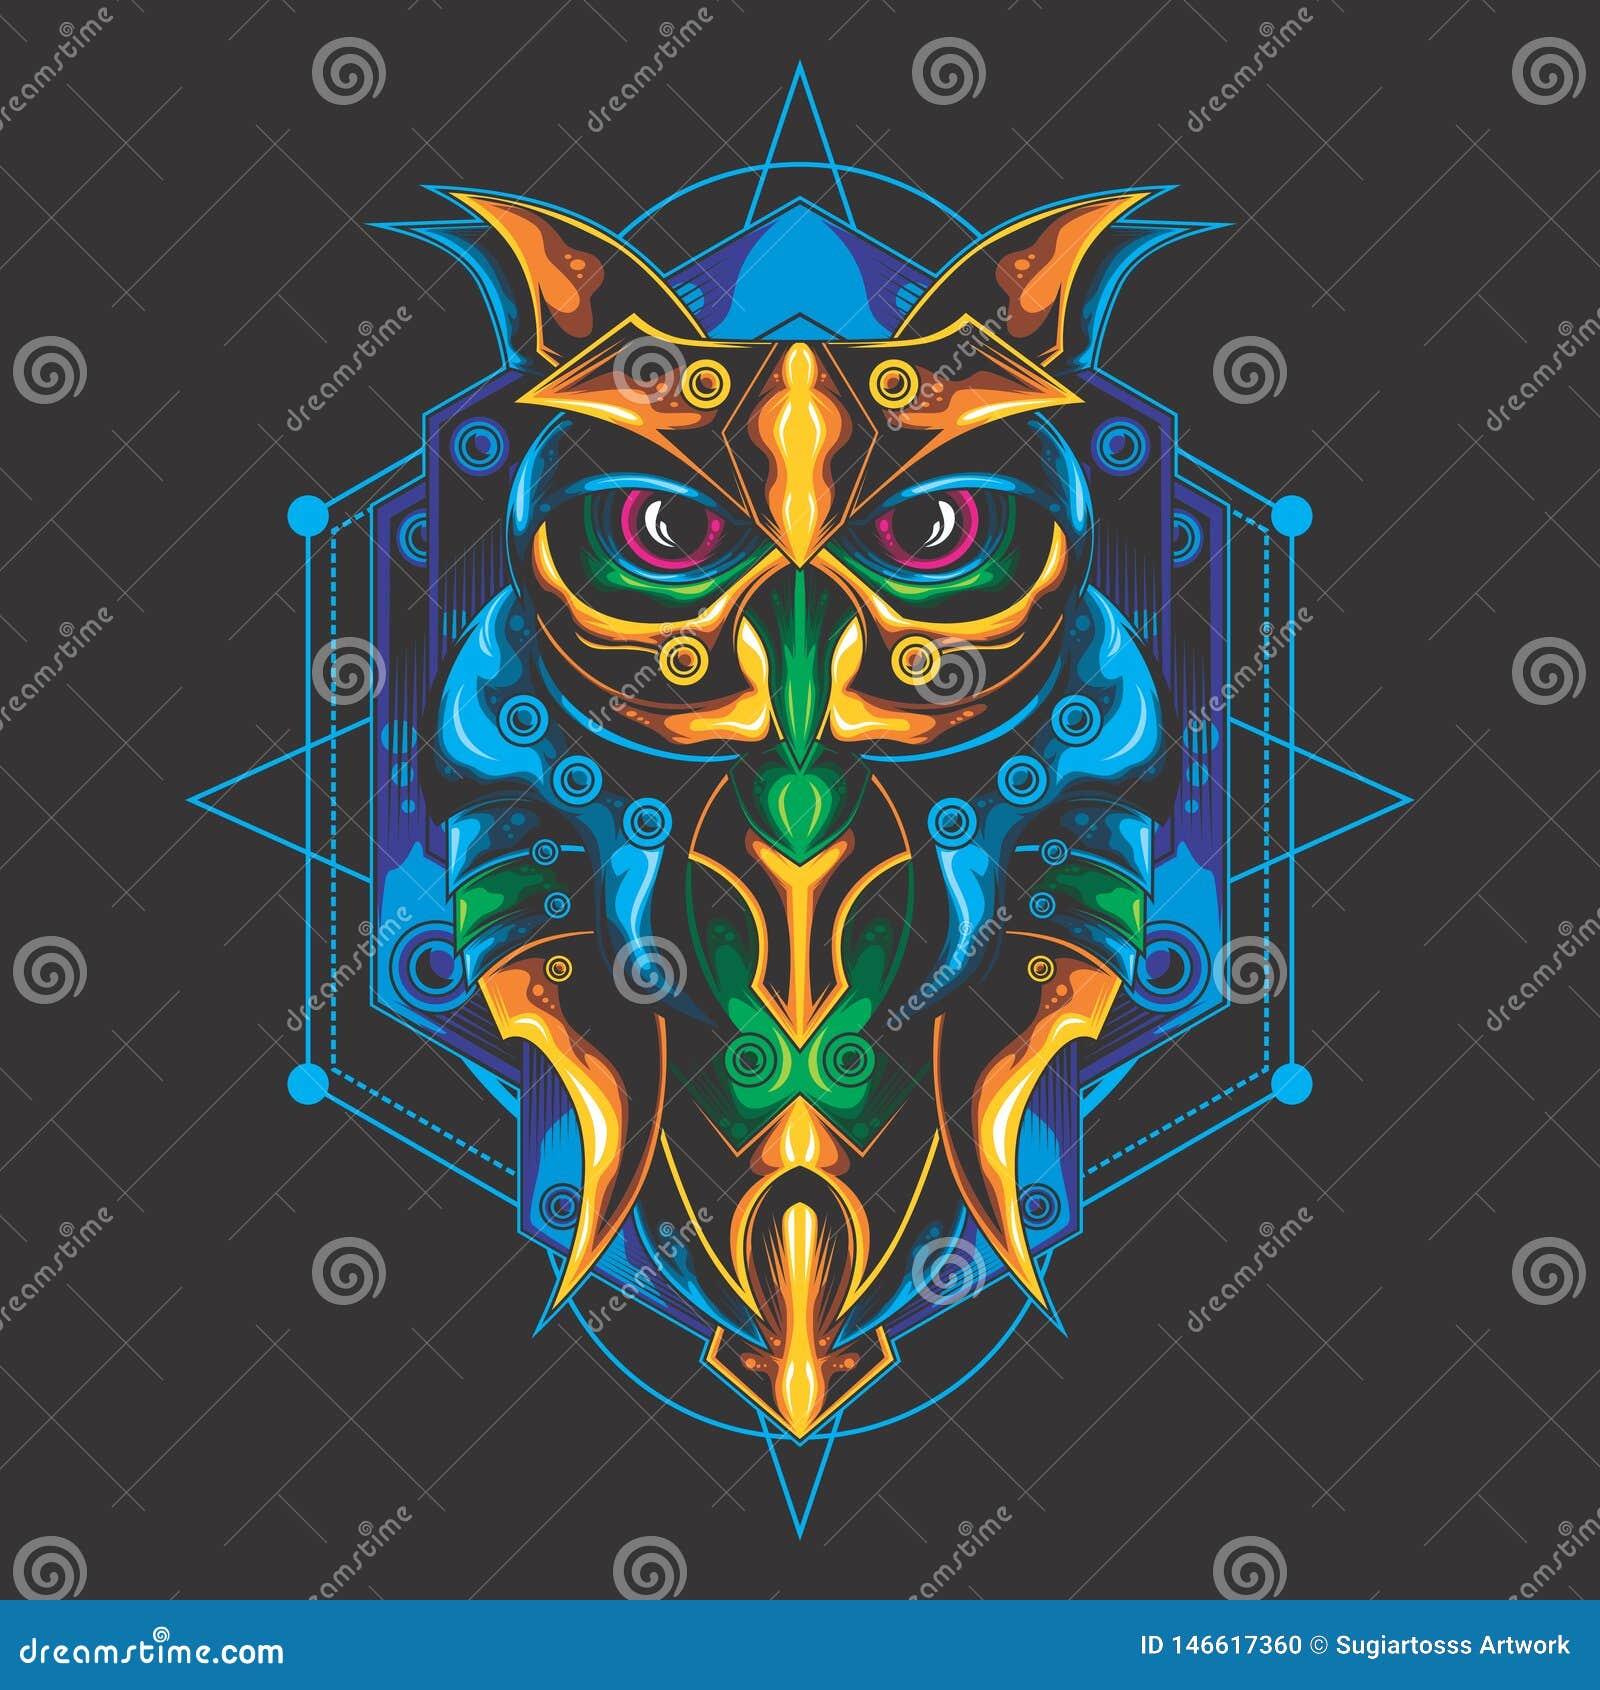 Mystical owl design